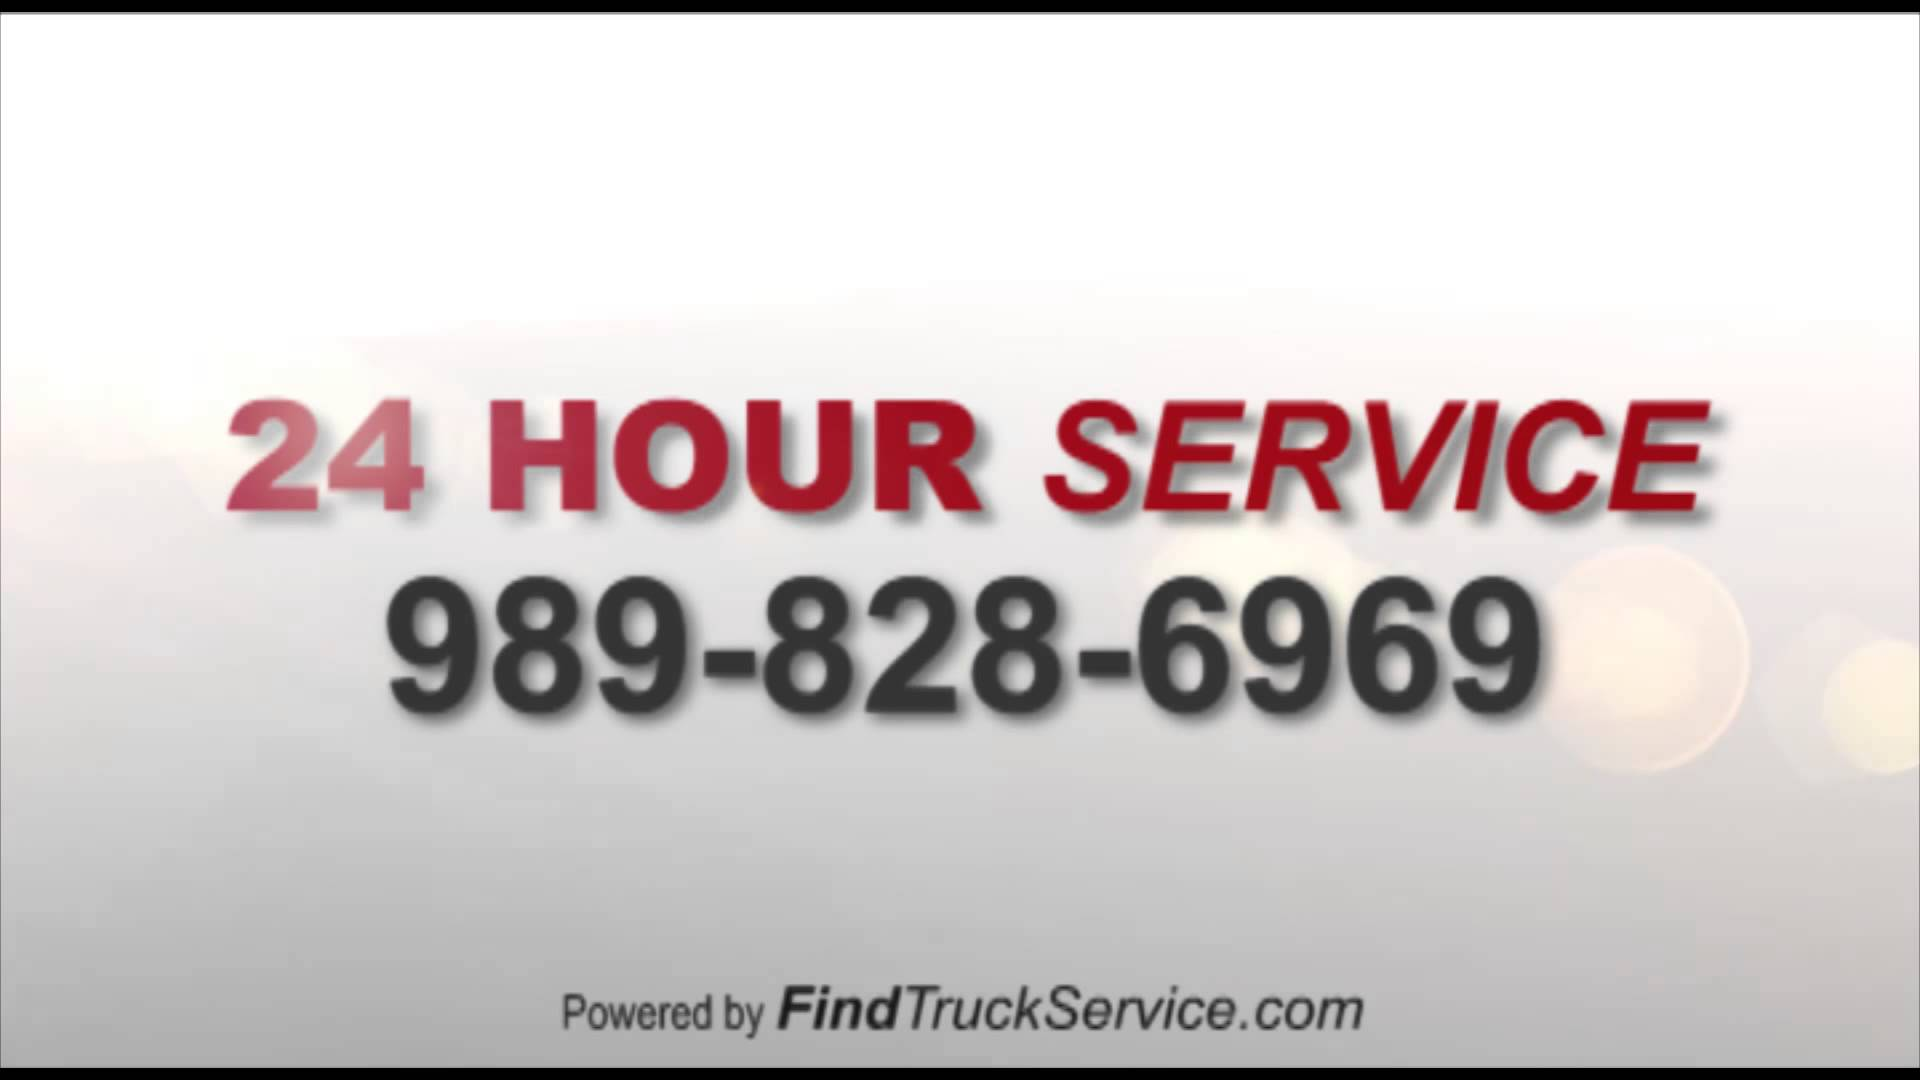 AA Truck Towing & Roadside Repair in Mount Pleasant, MI | 24 Hour Find Truck Service